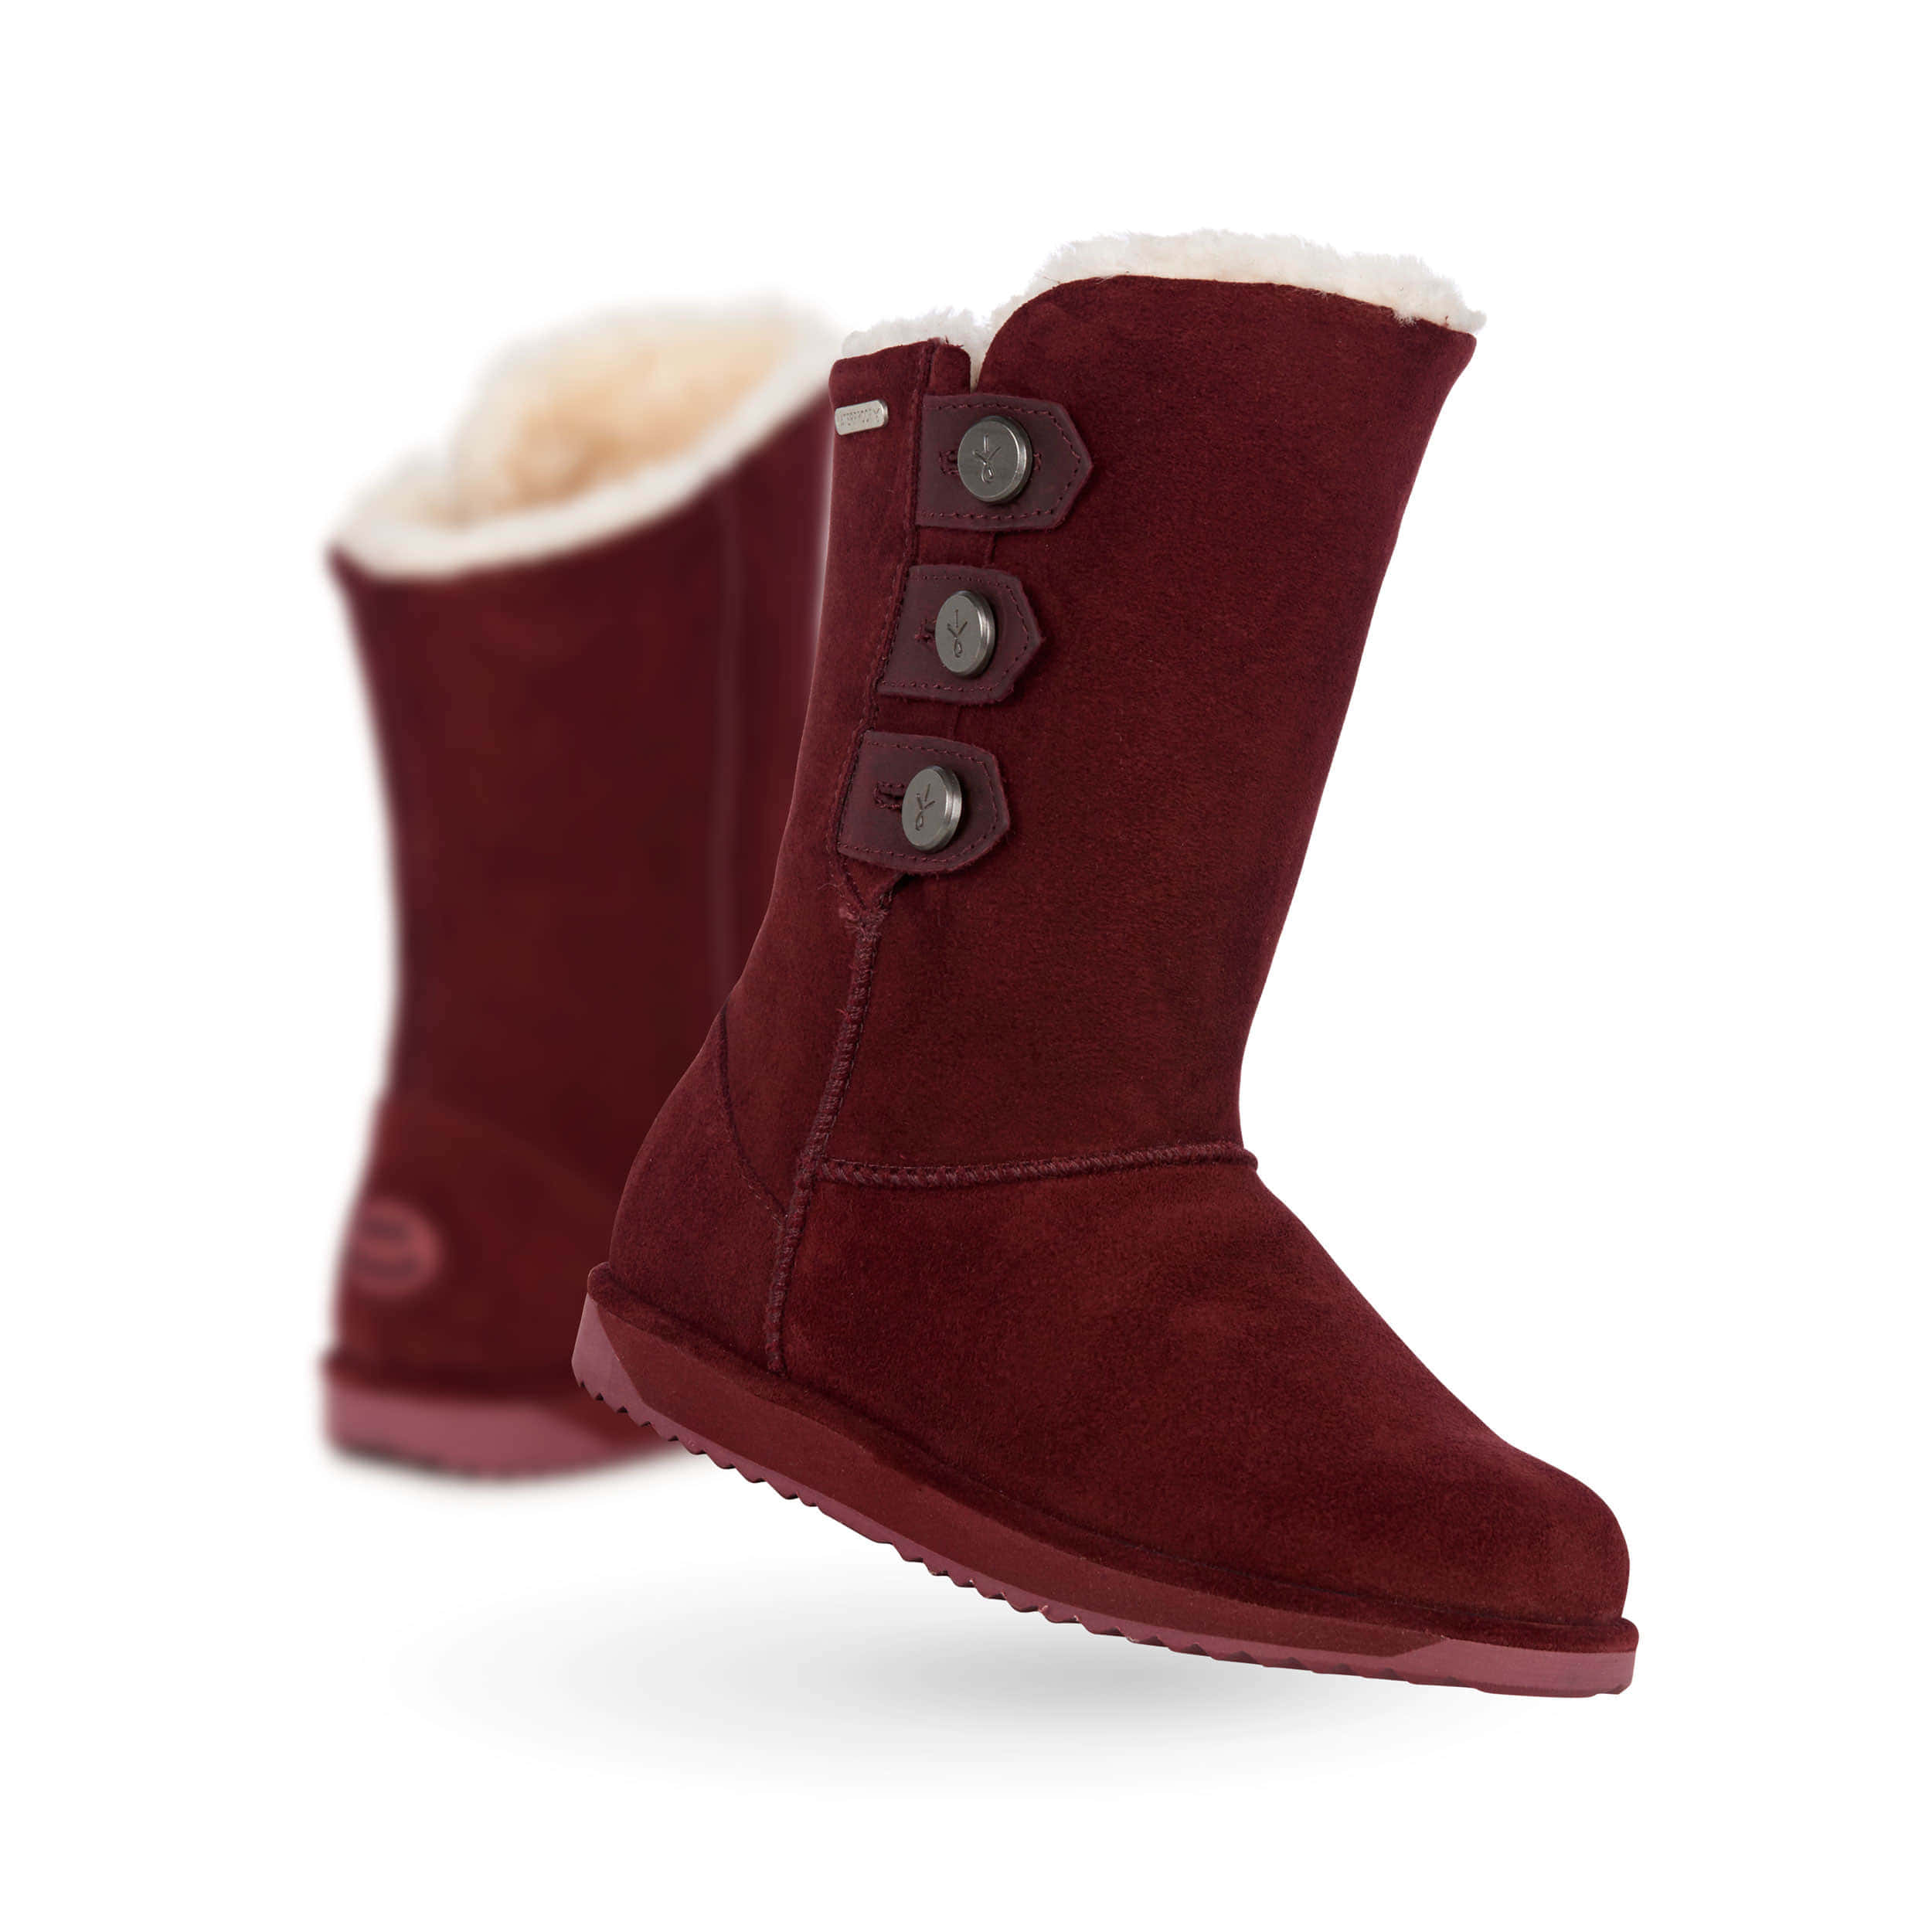 55feba9a6db Buy Emu Captain Waterproof Sheepskin Boots · AfterPay Zip · The Wool ...